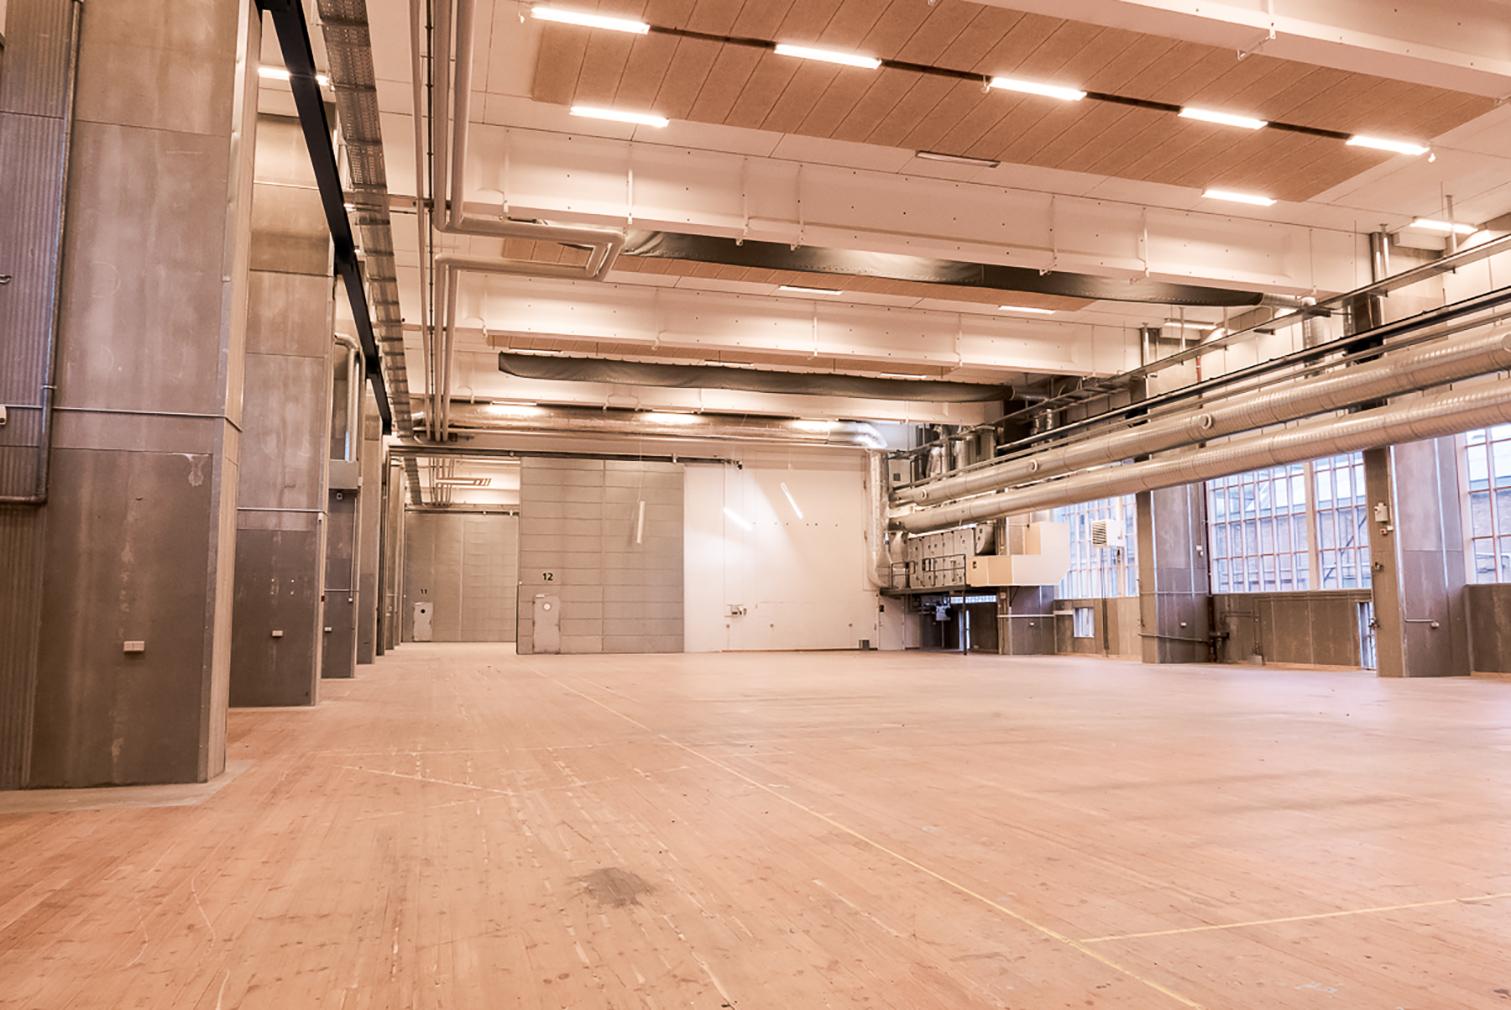 B&W's old welding hall from the inside. Copenhagen Contemporary, 2018. Photograph: Alex Laroux